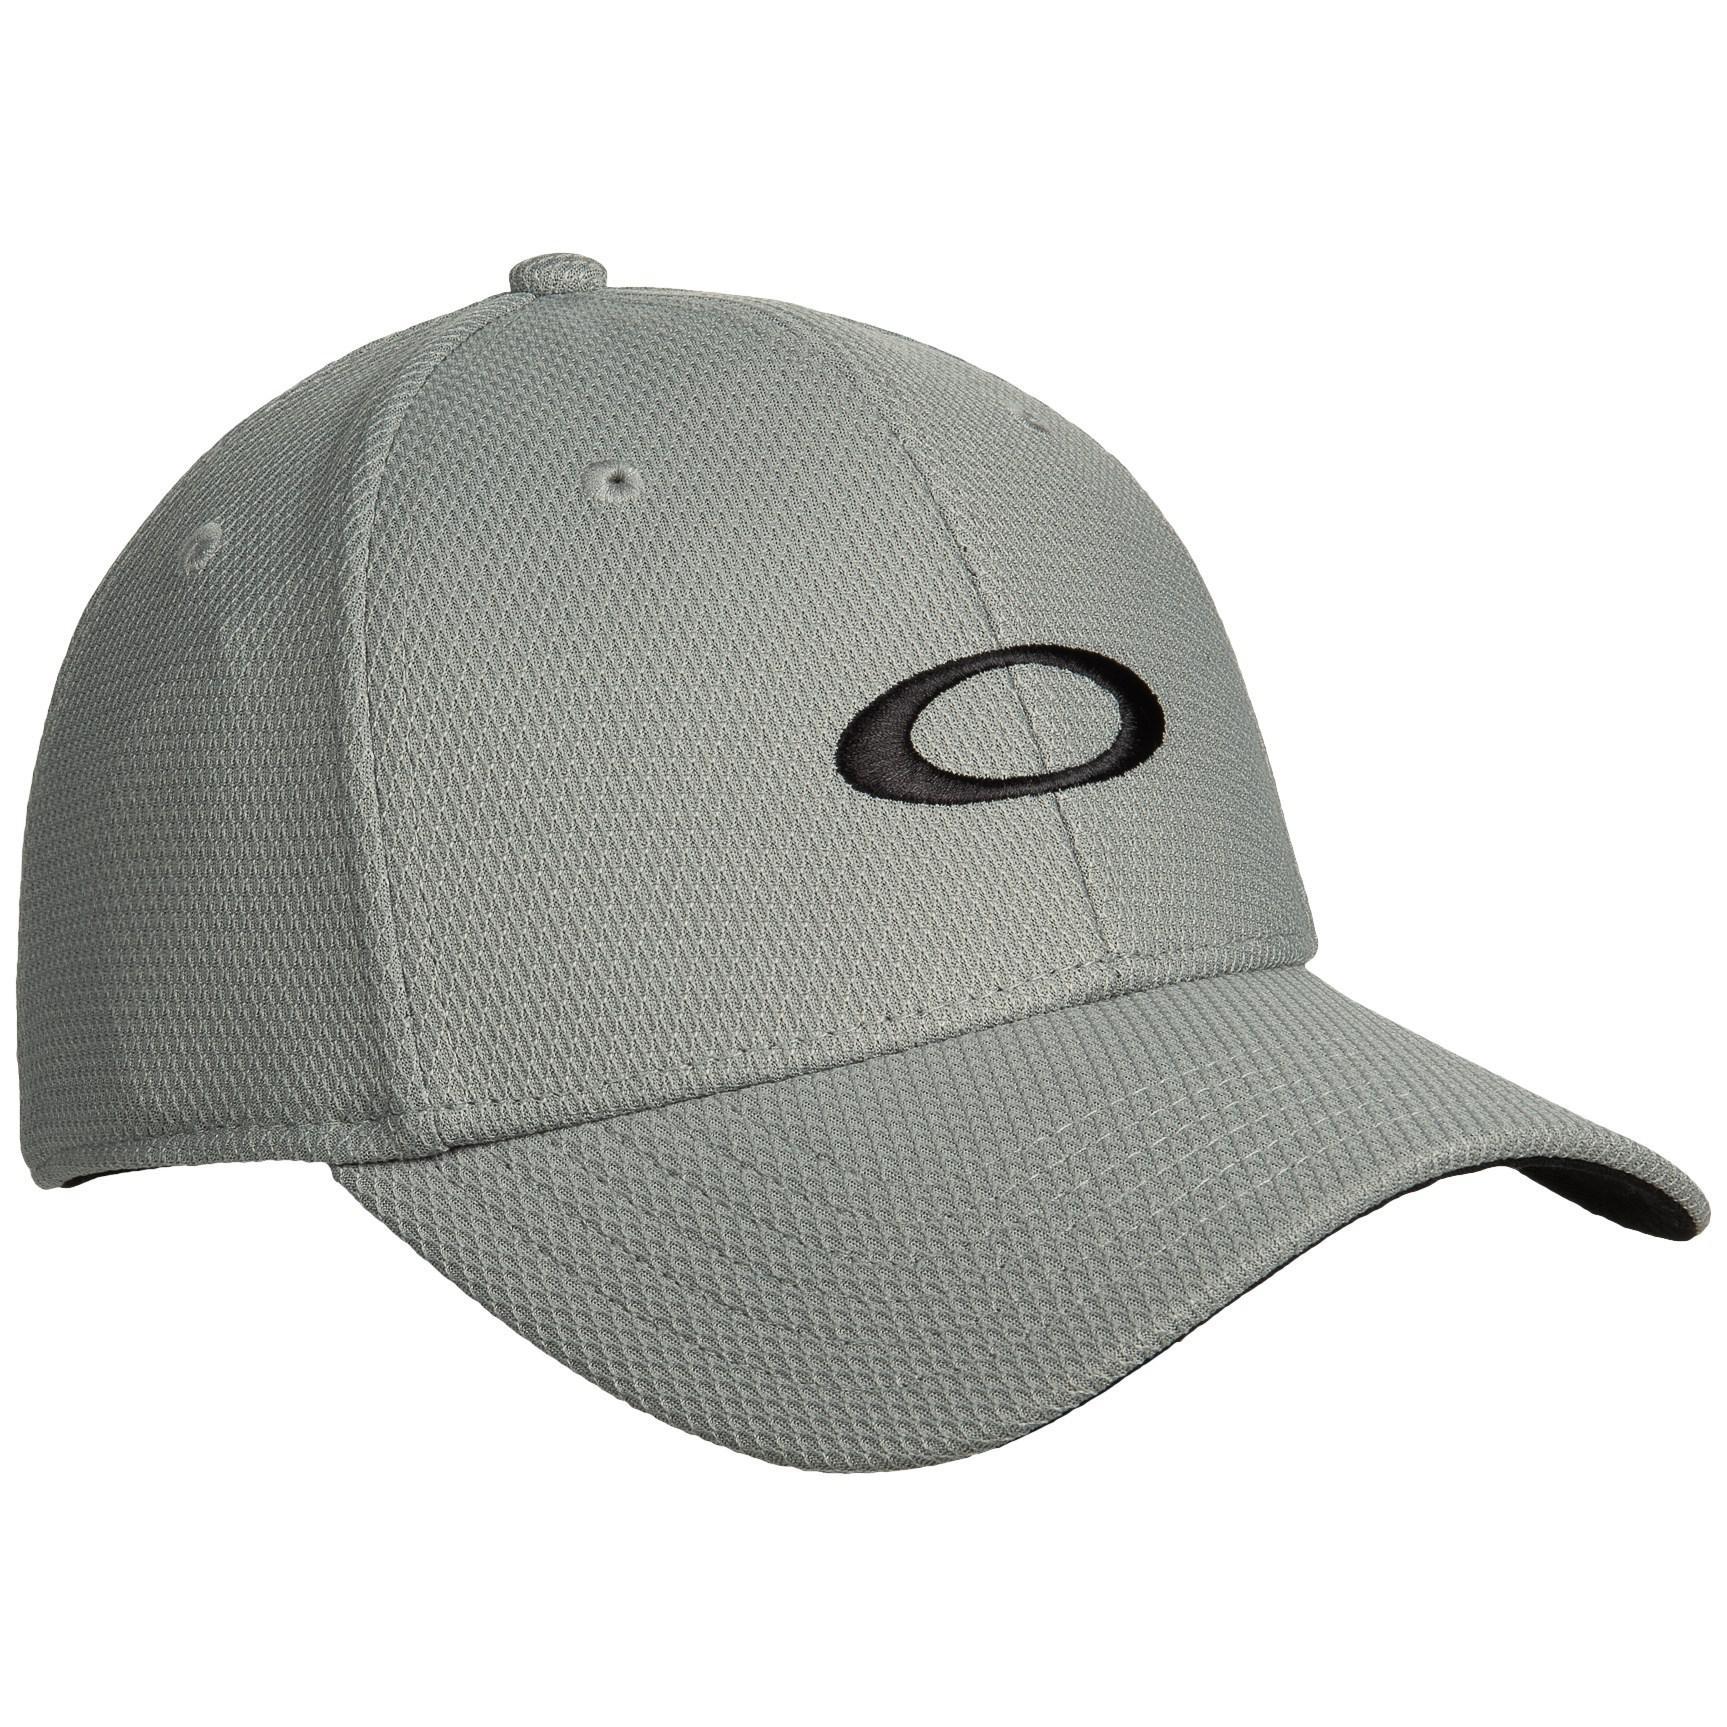 Lyst - Oakley Golf Ellipse Baseball Cap (for Men) in Gray for Men 4d5b910cb72a